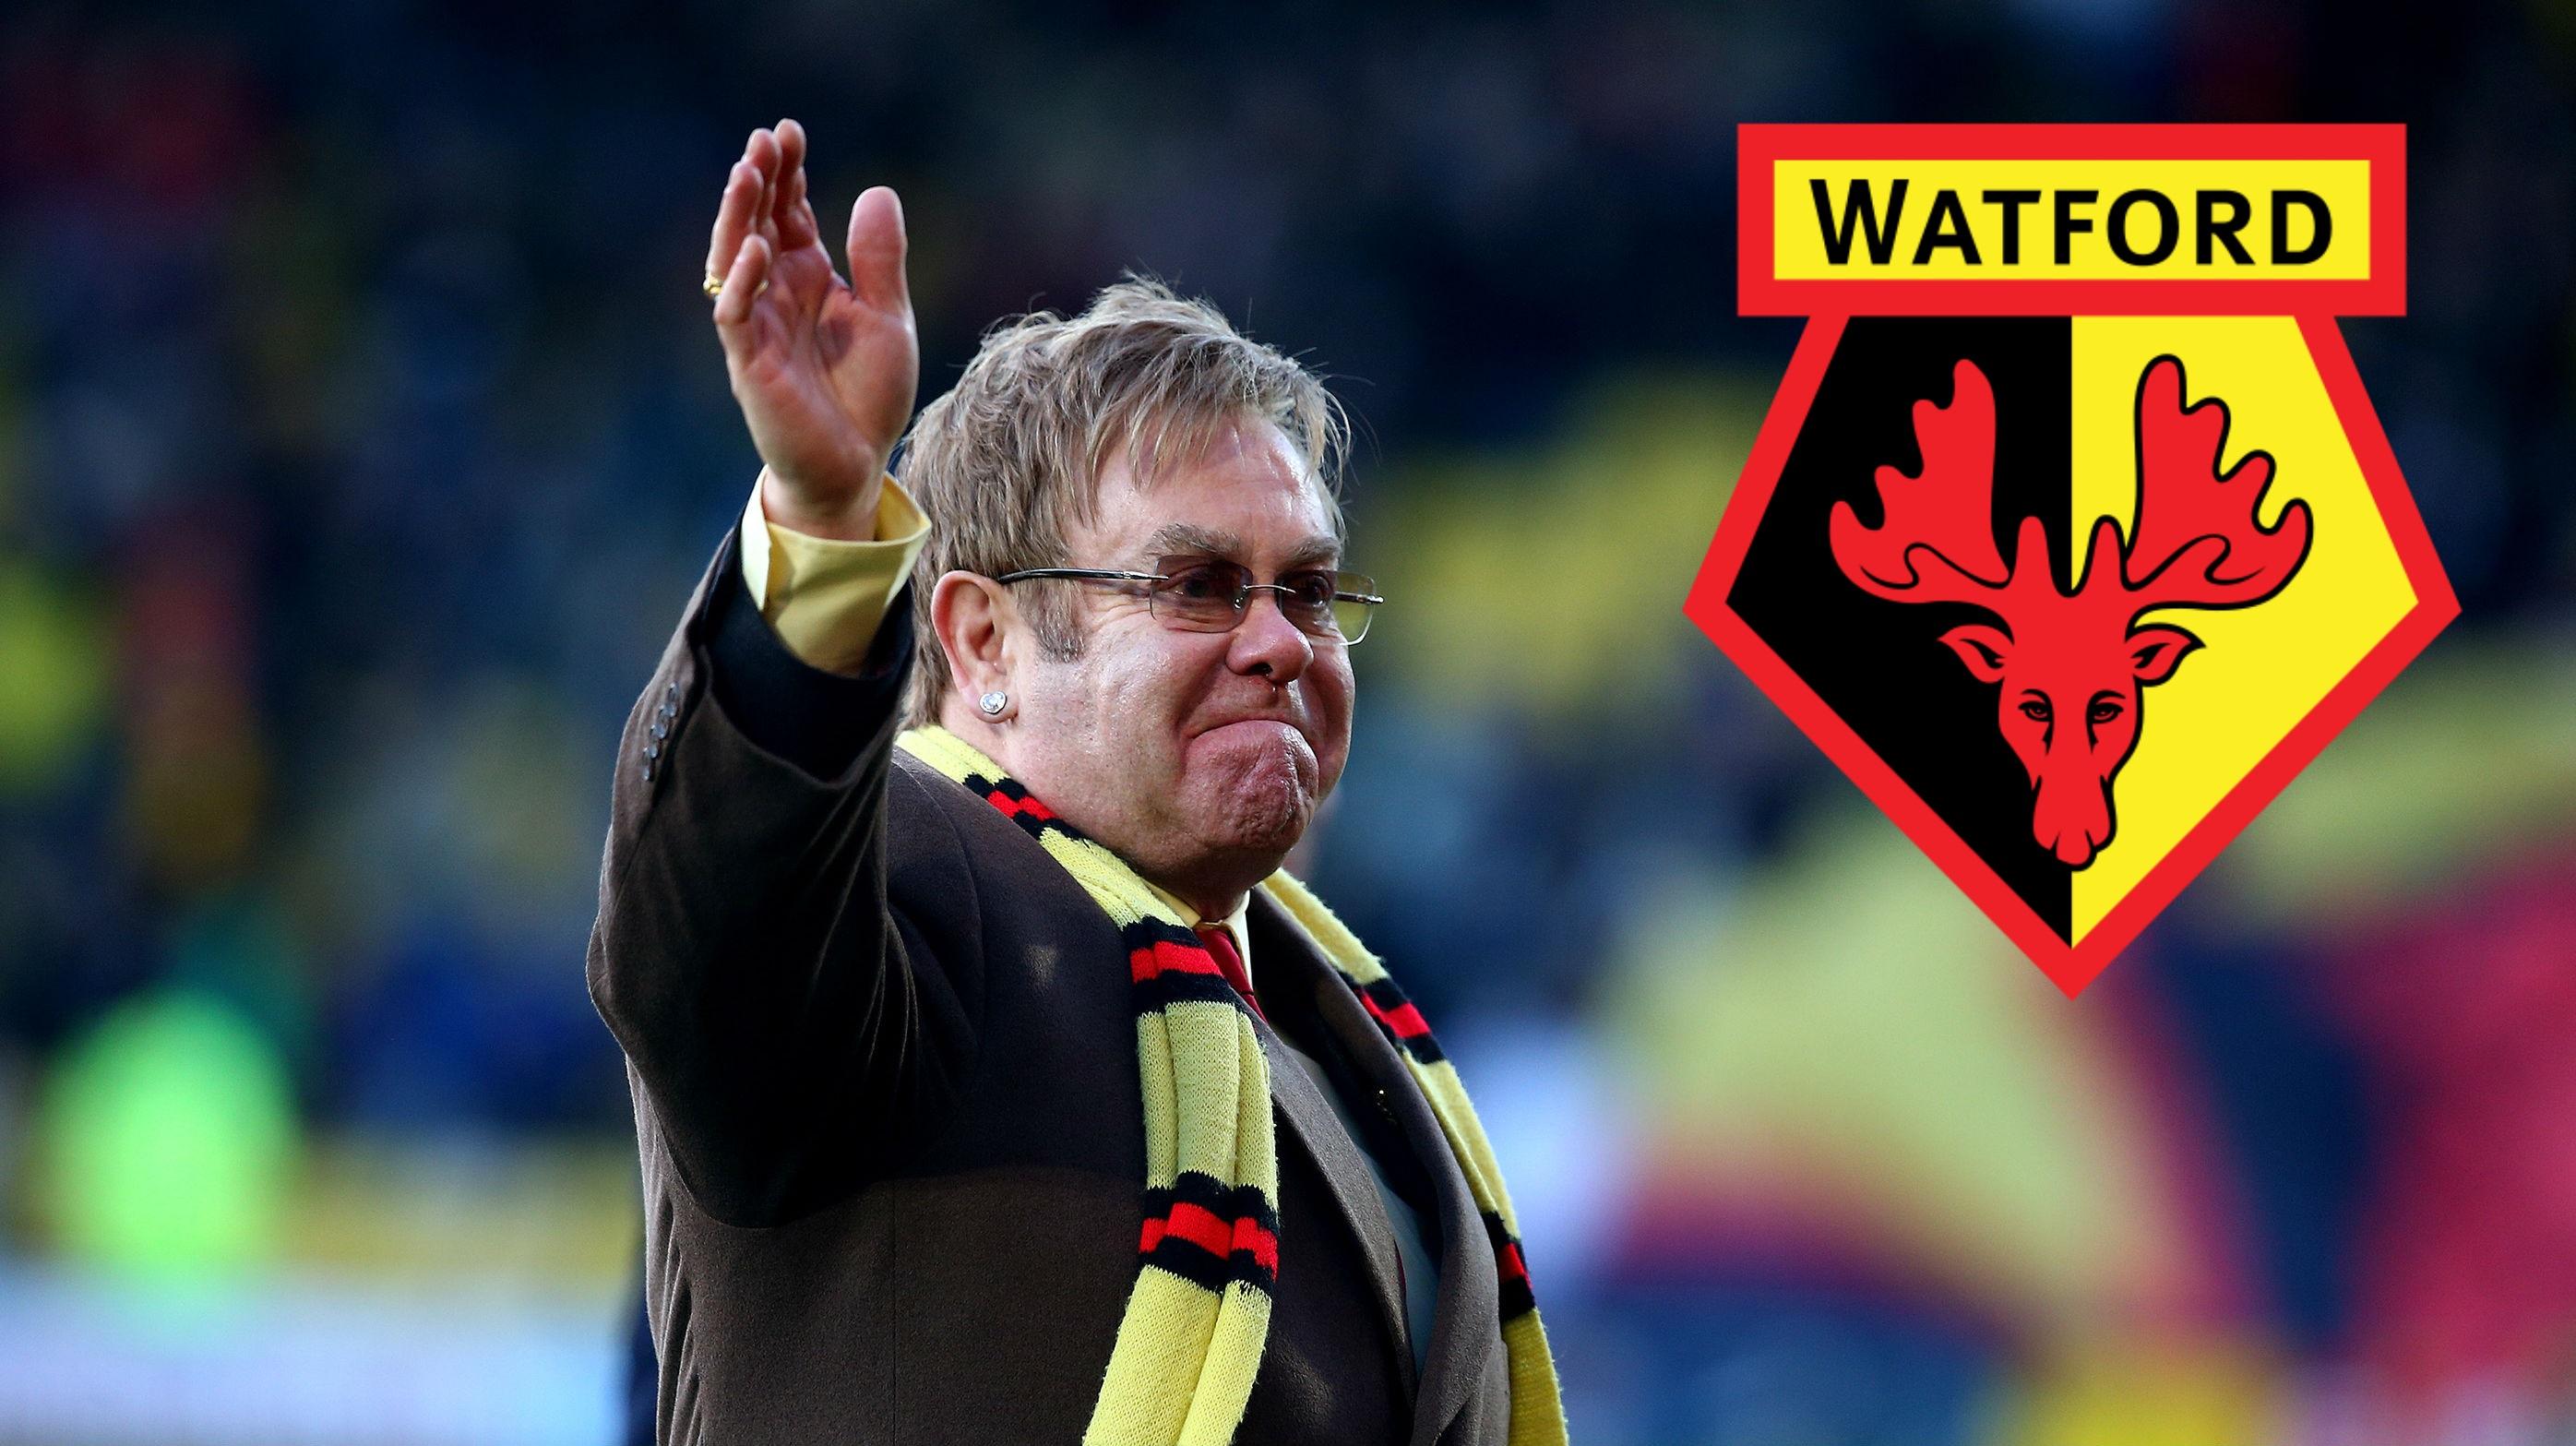 Elton John 25092015